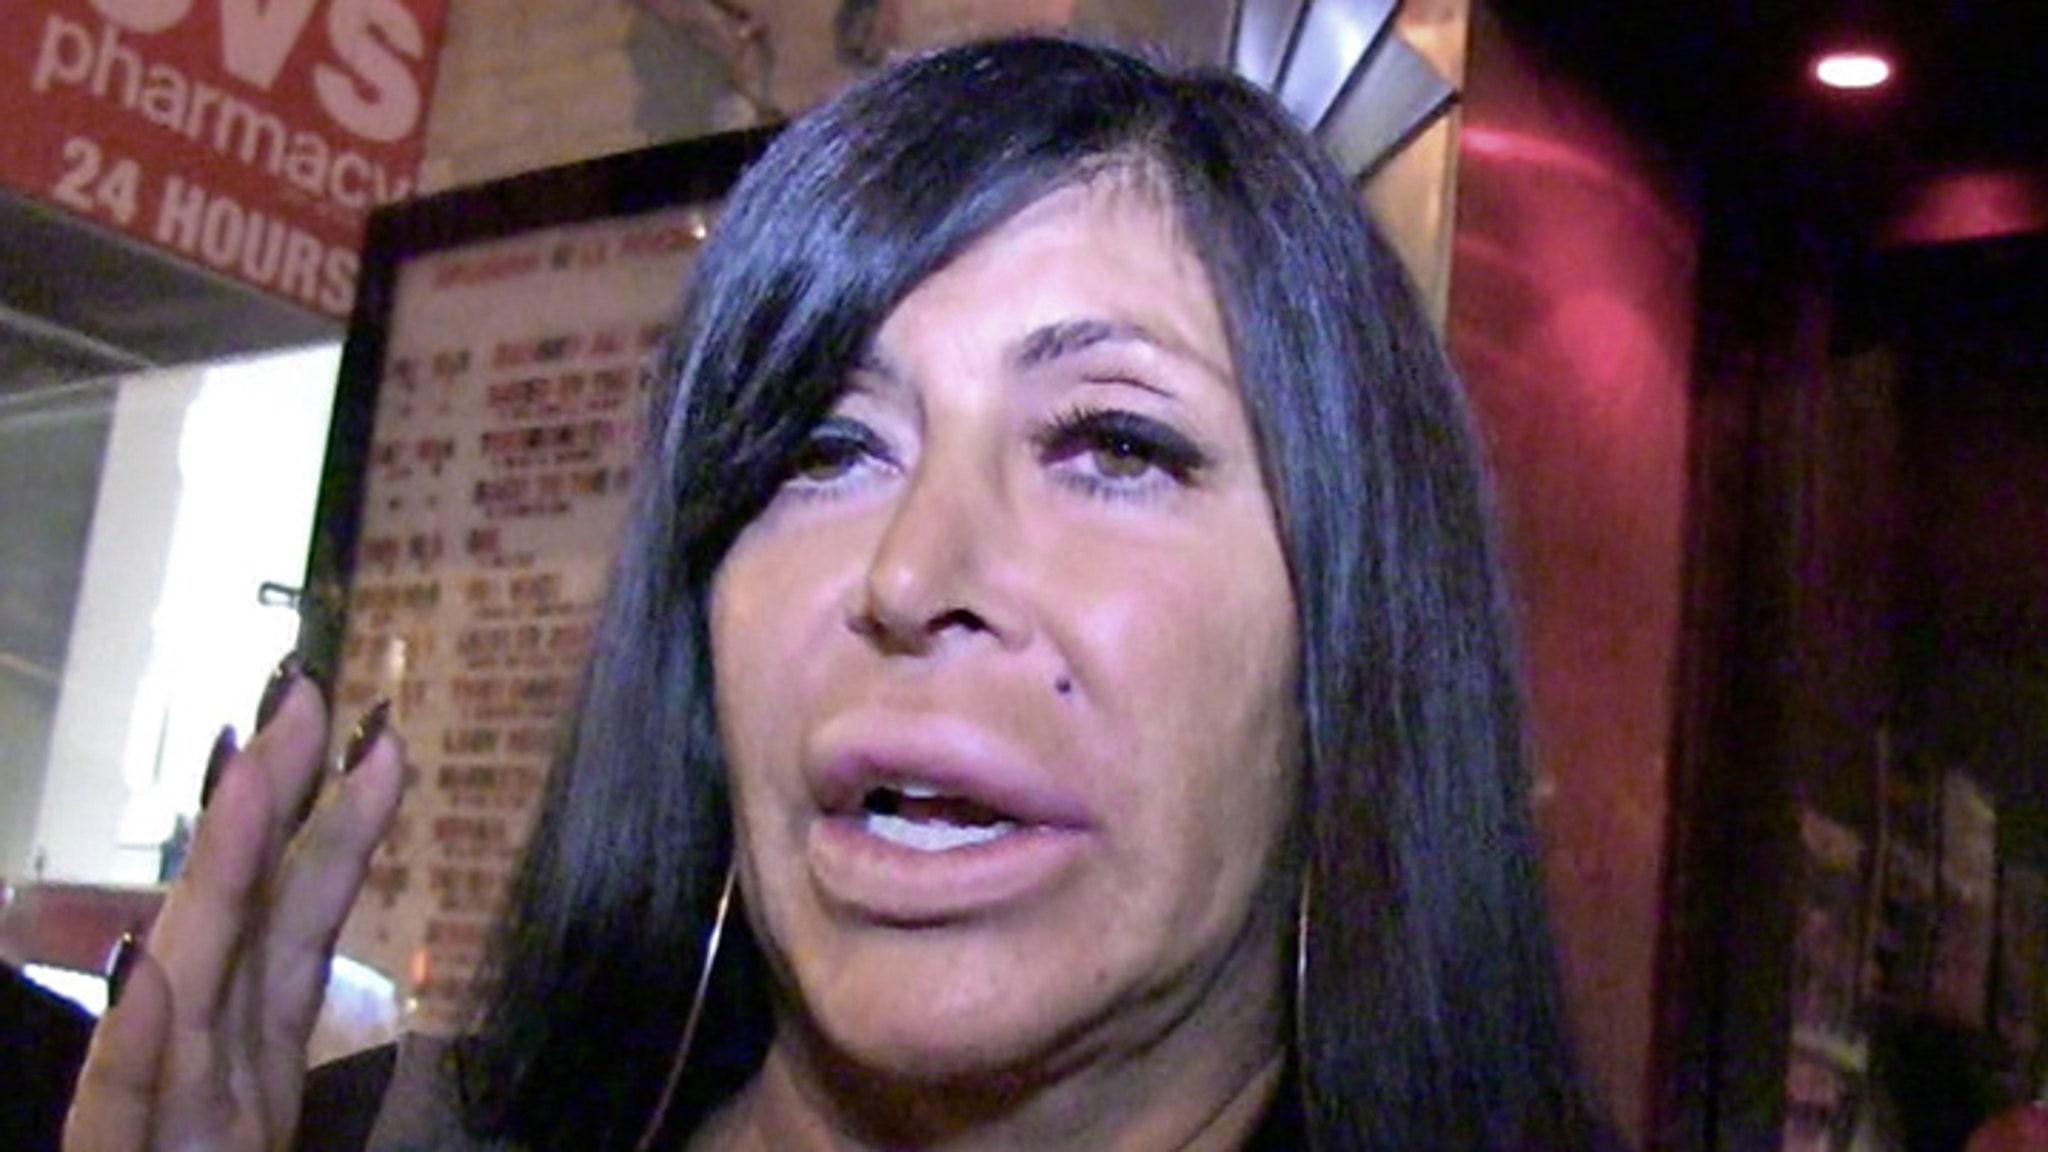 Mob Wives Star Angela Raiola Is Still Alive, Despite